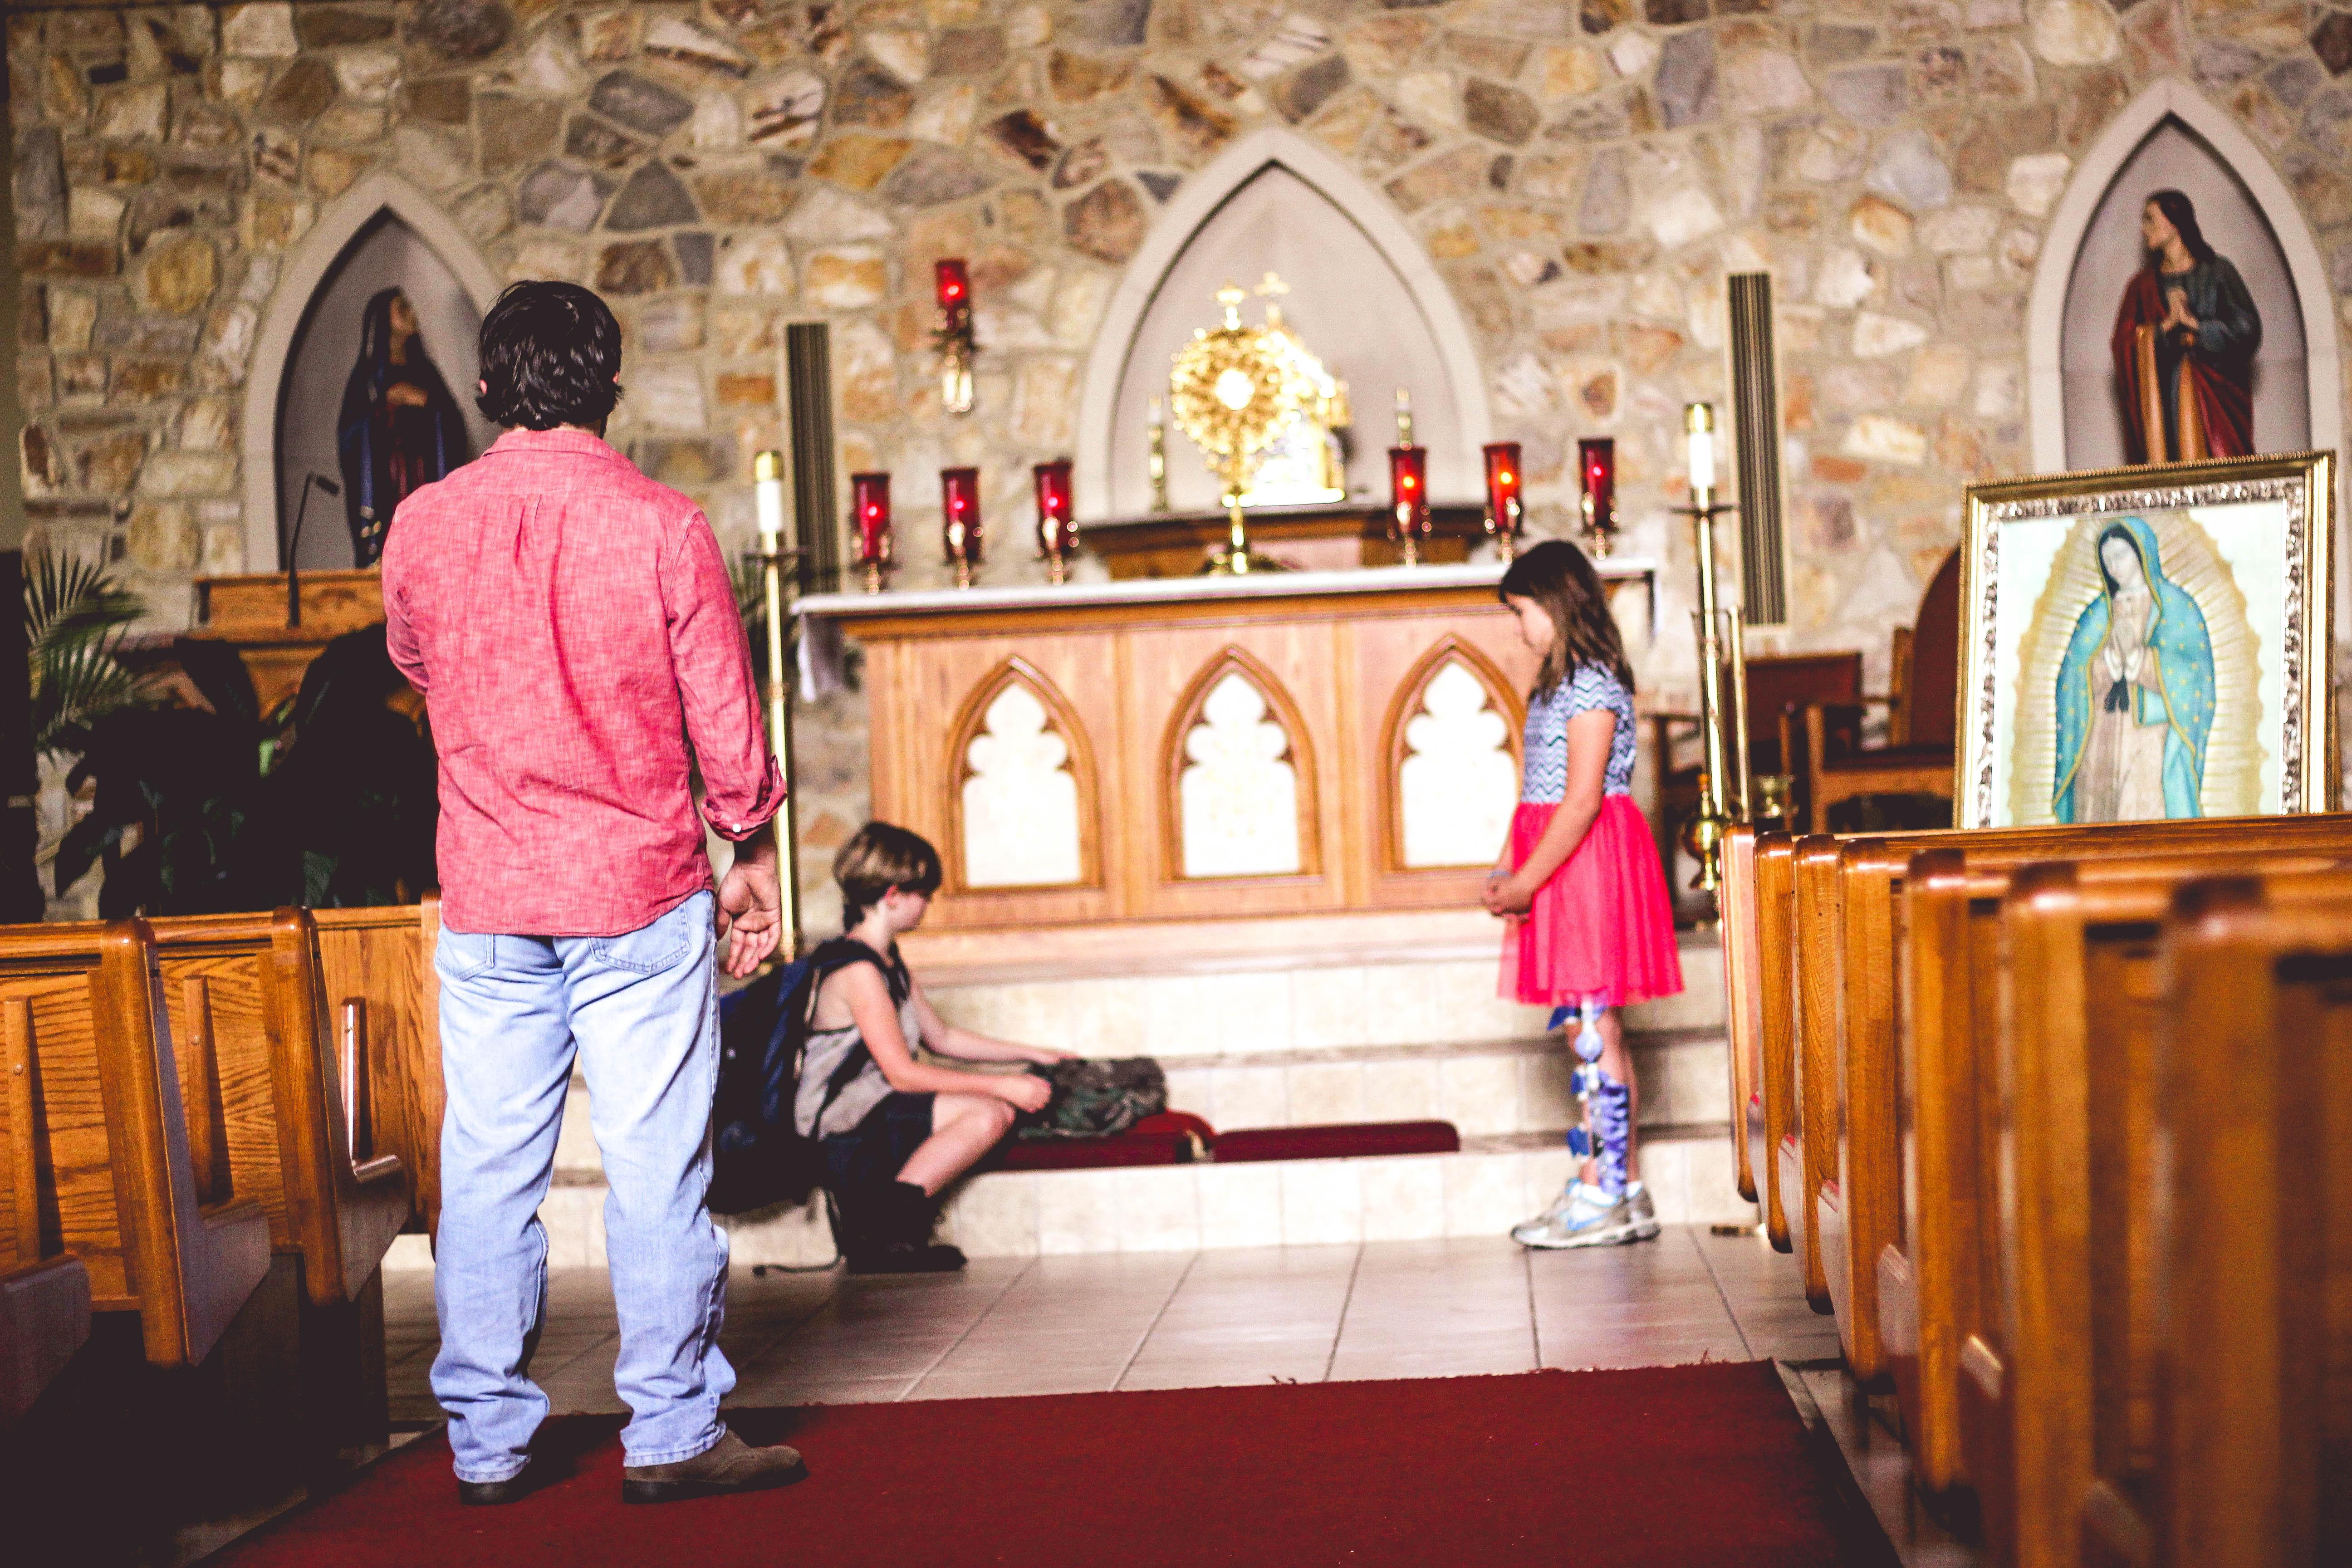 Mise en scène (Éric Rohmer, Pray For Us)